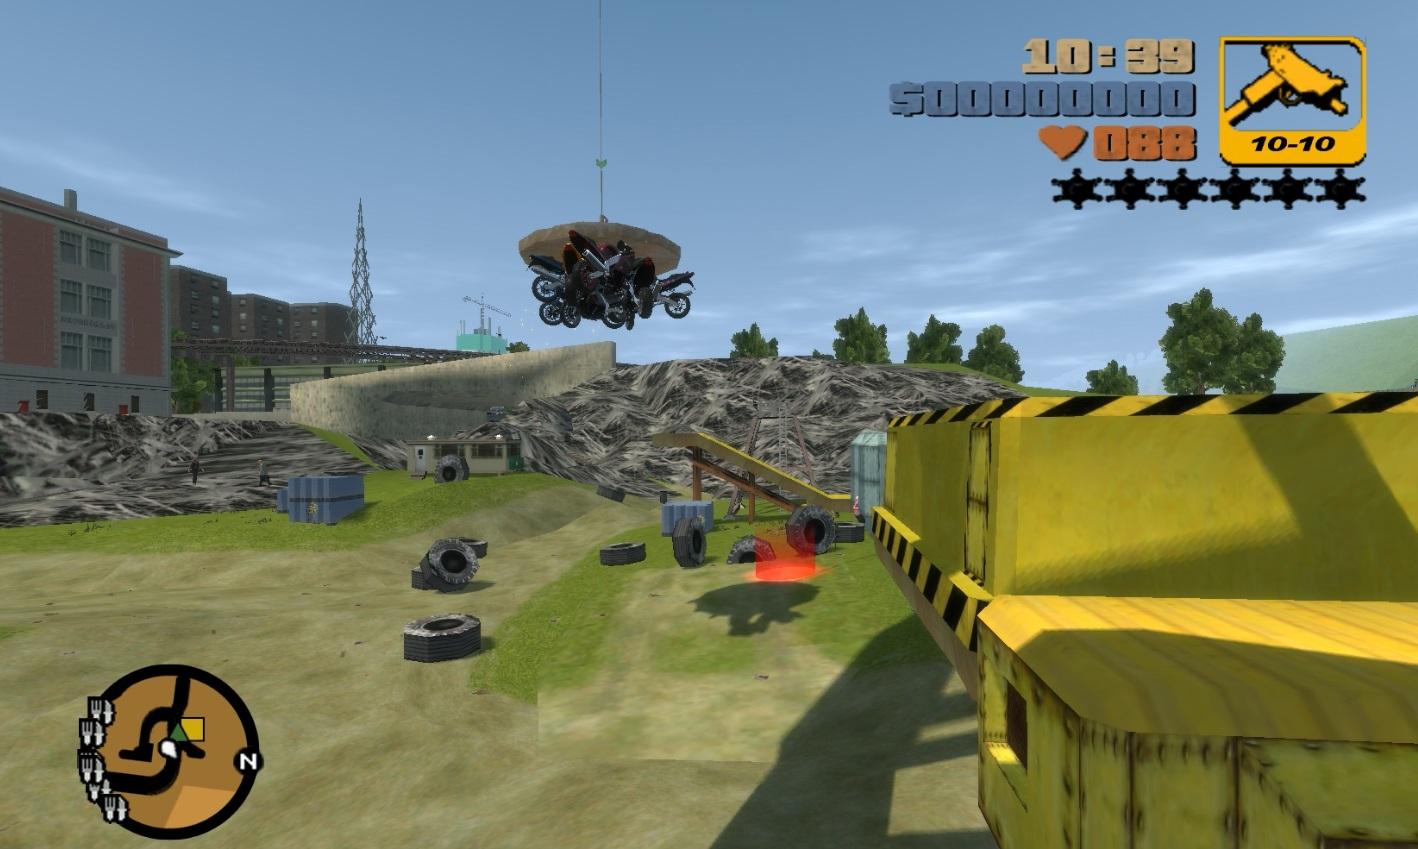 GTA X Scripting: GTA 3 Rage Classic - Junkyard car smasher add-on